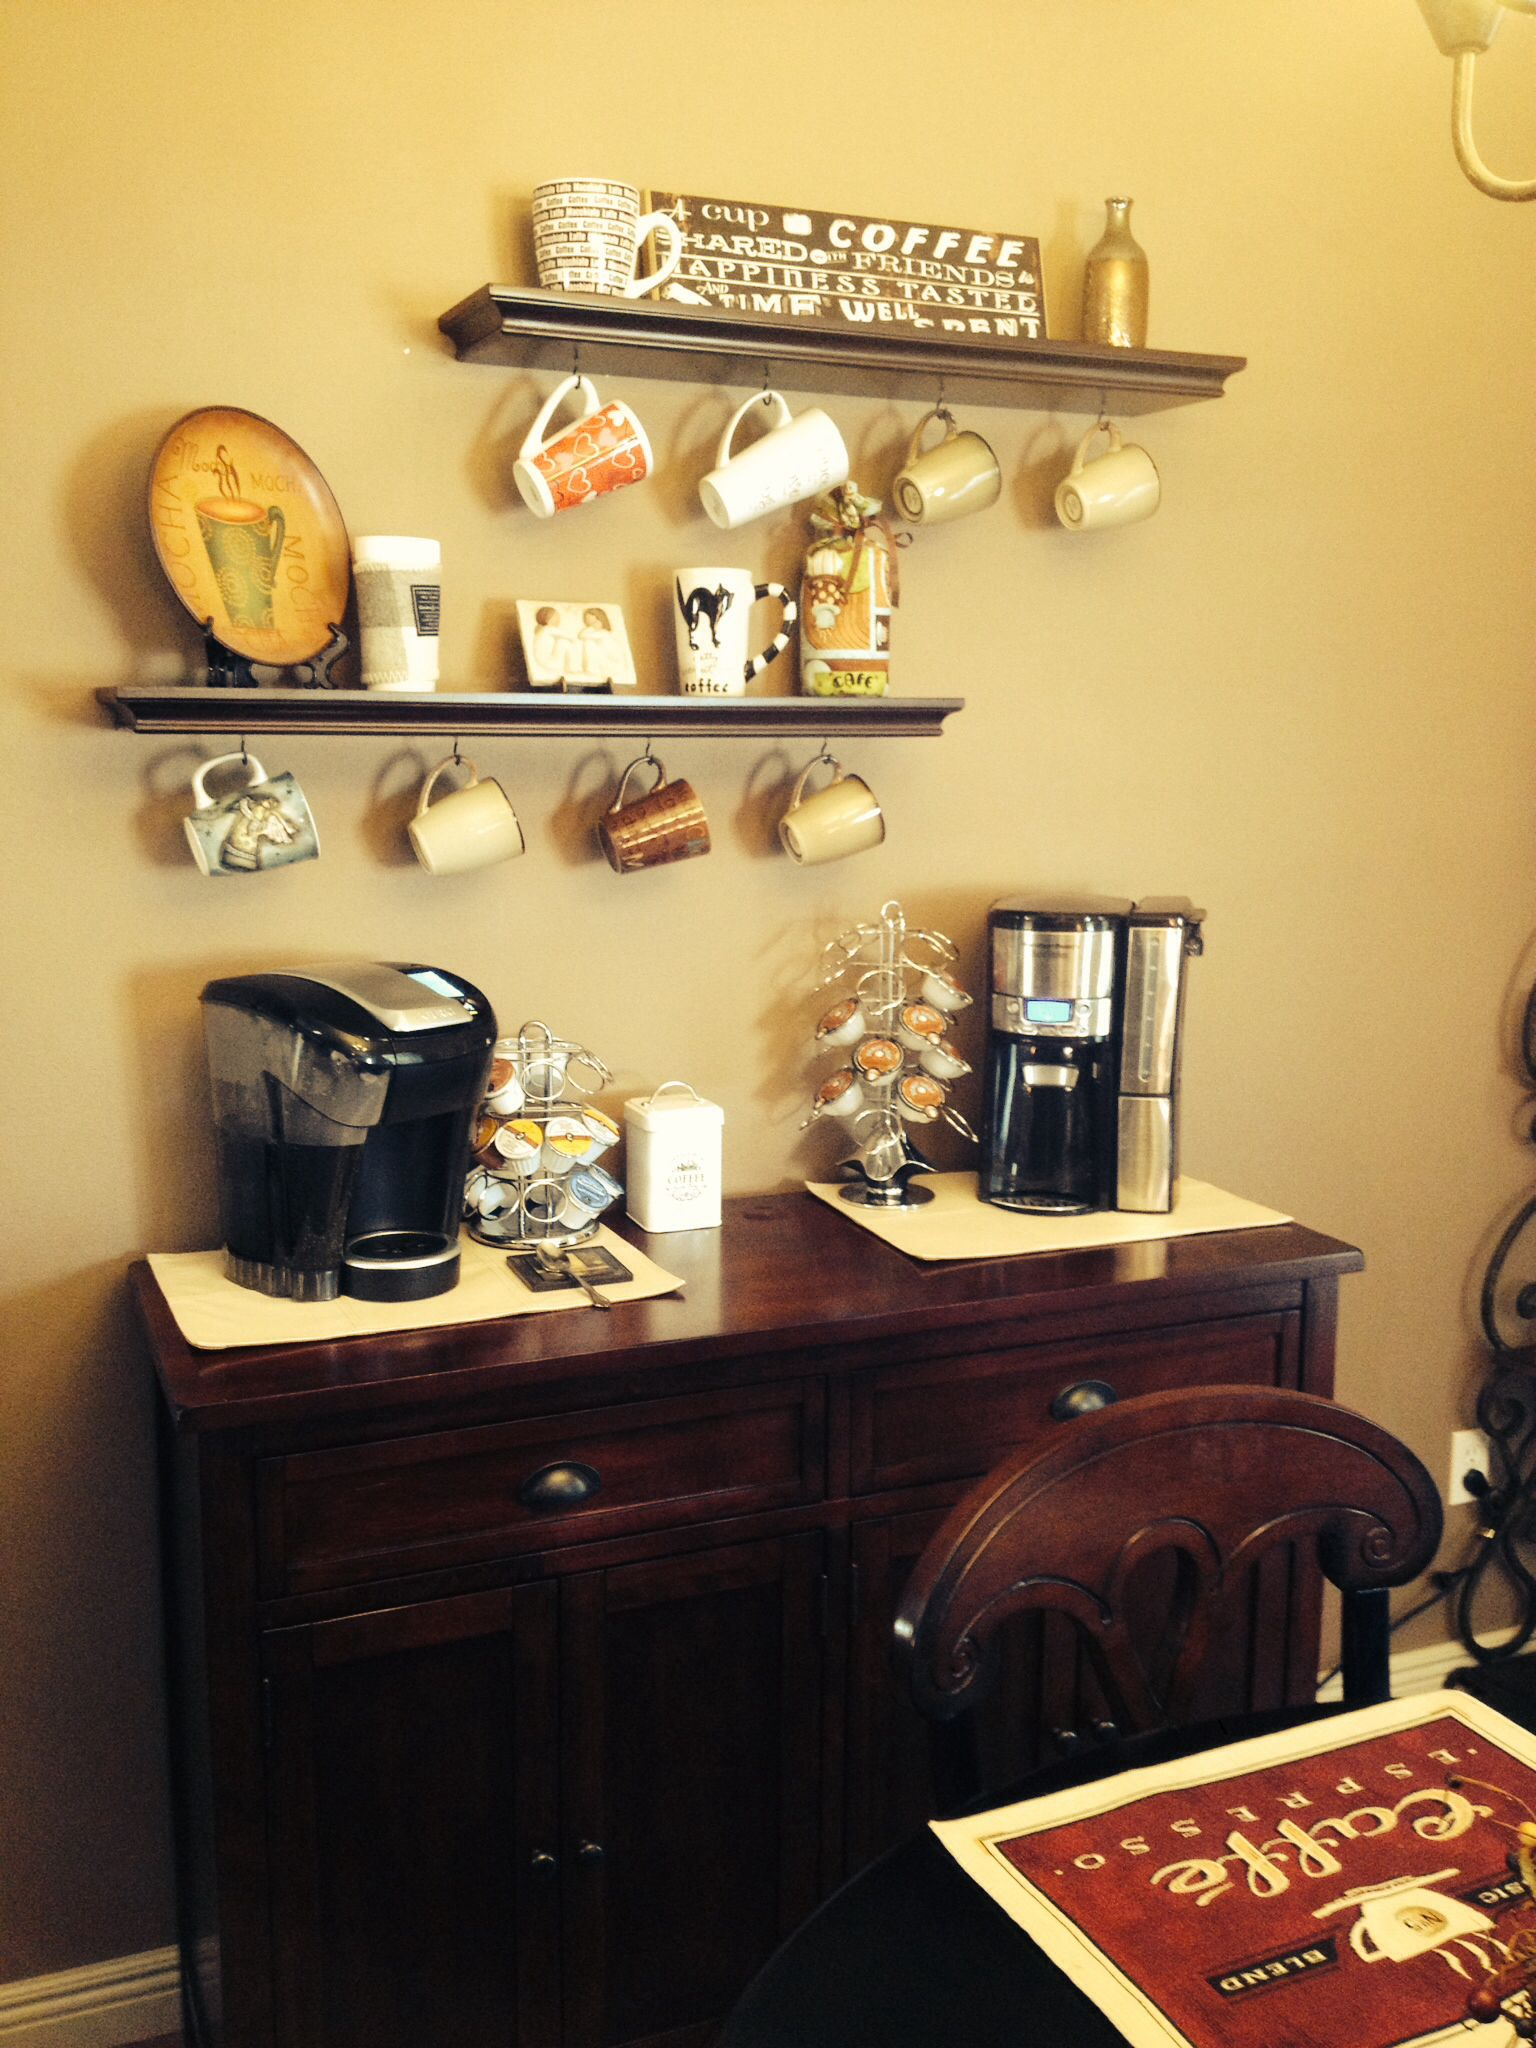 Coffee bar ideas | Vet clinic/Kennel ideas | Pinterest | Coffee, Bar ...